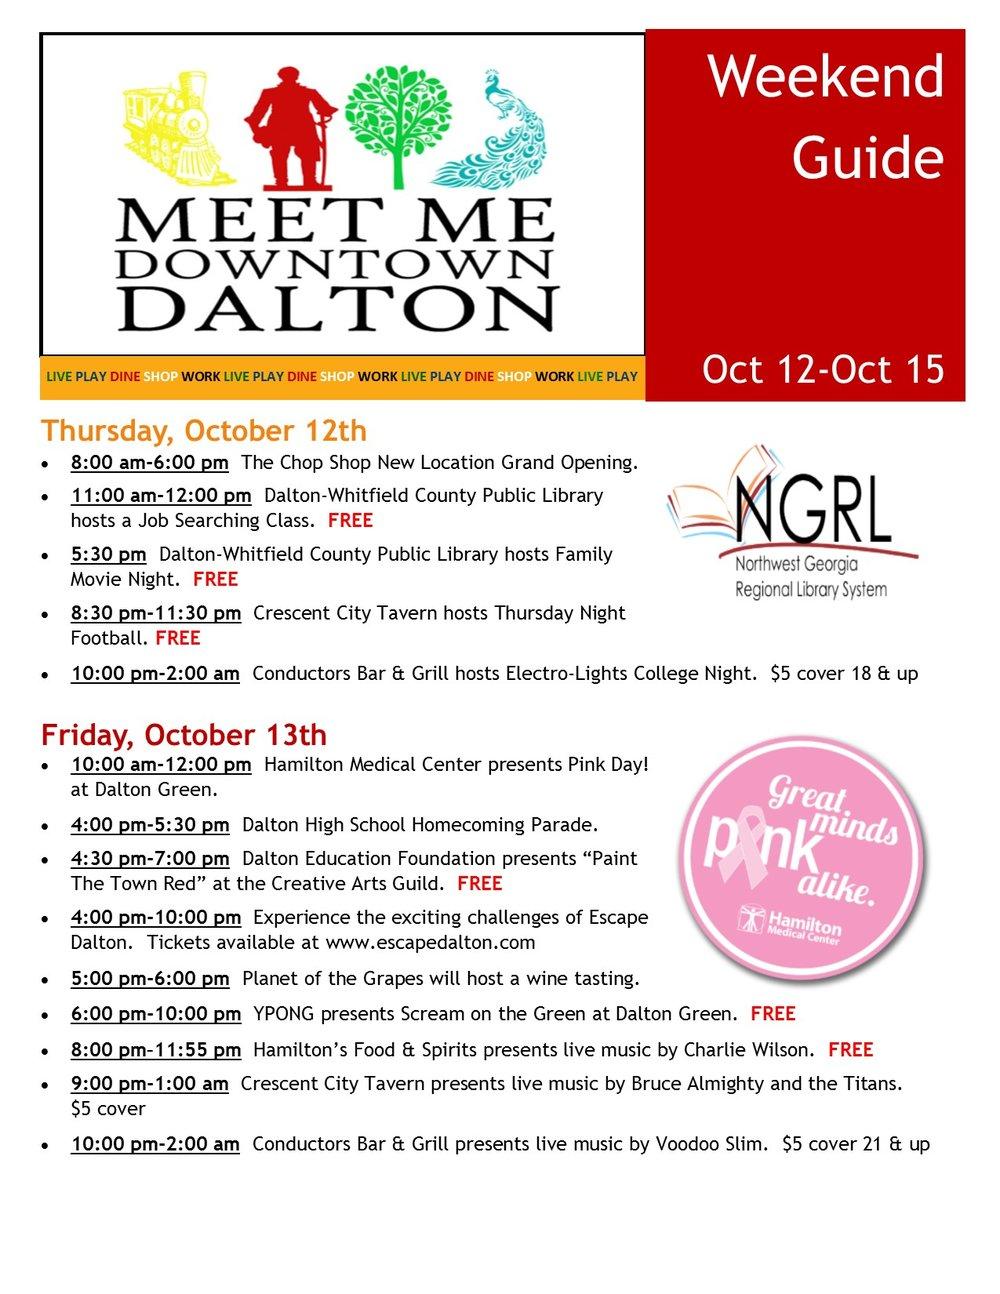 Newsletter Oct 12-Oct 15.jpg